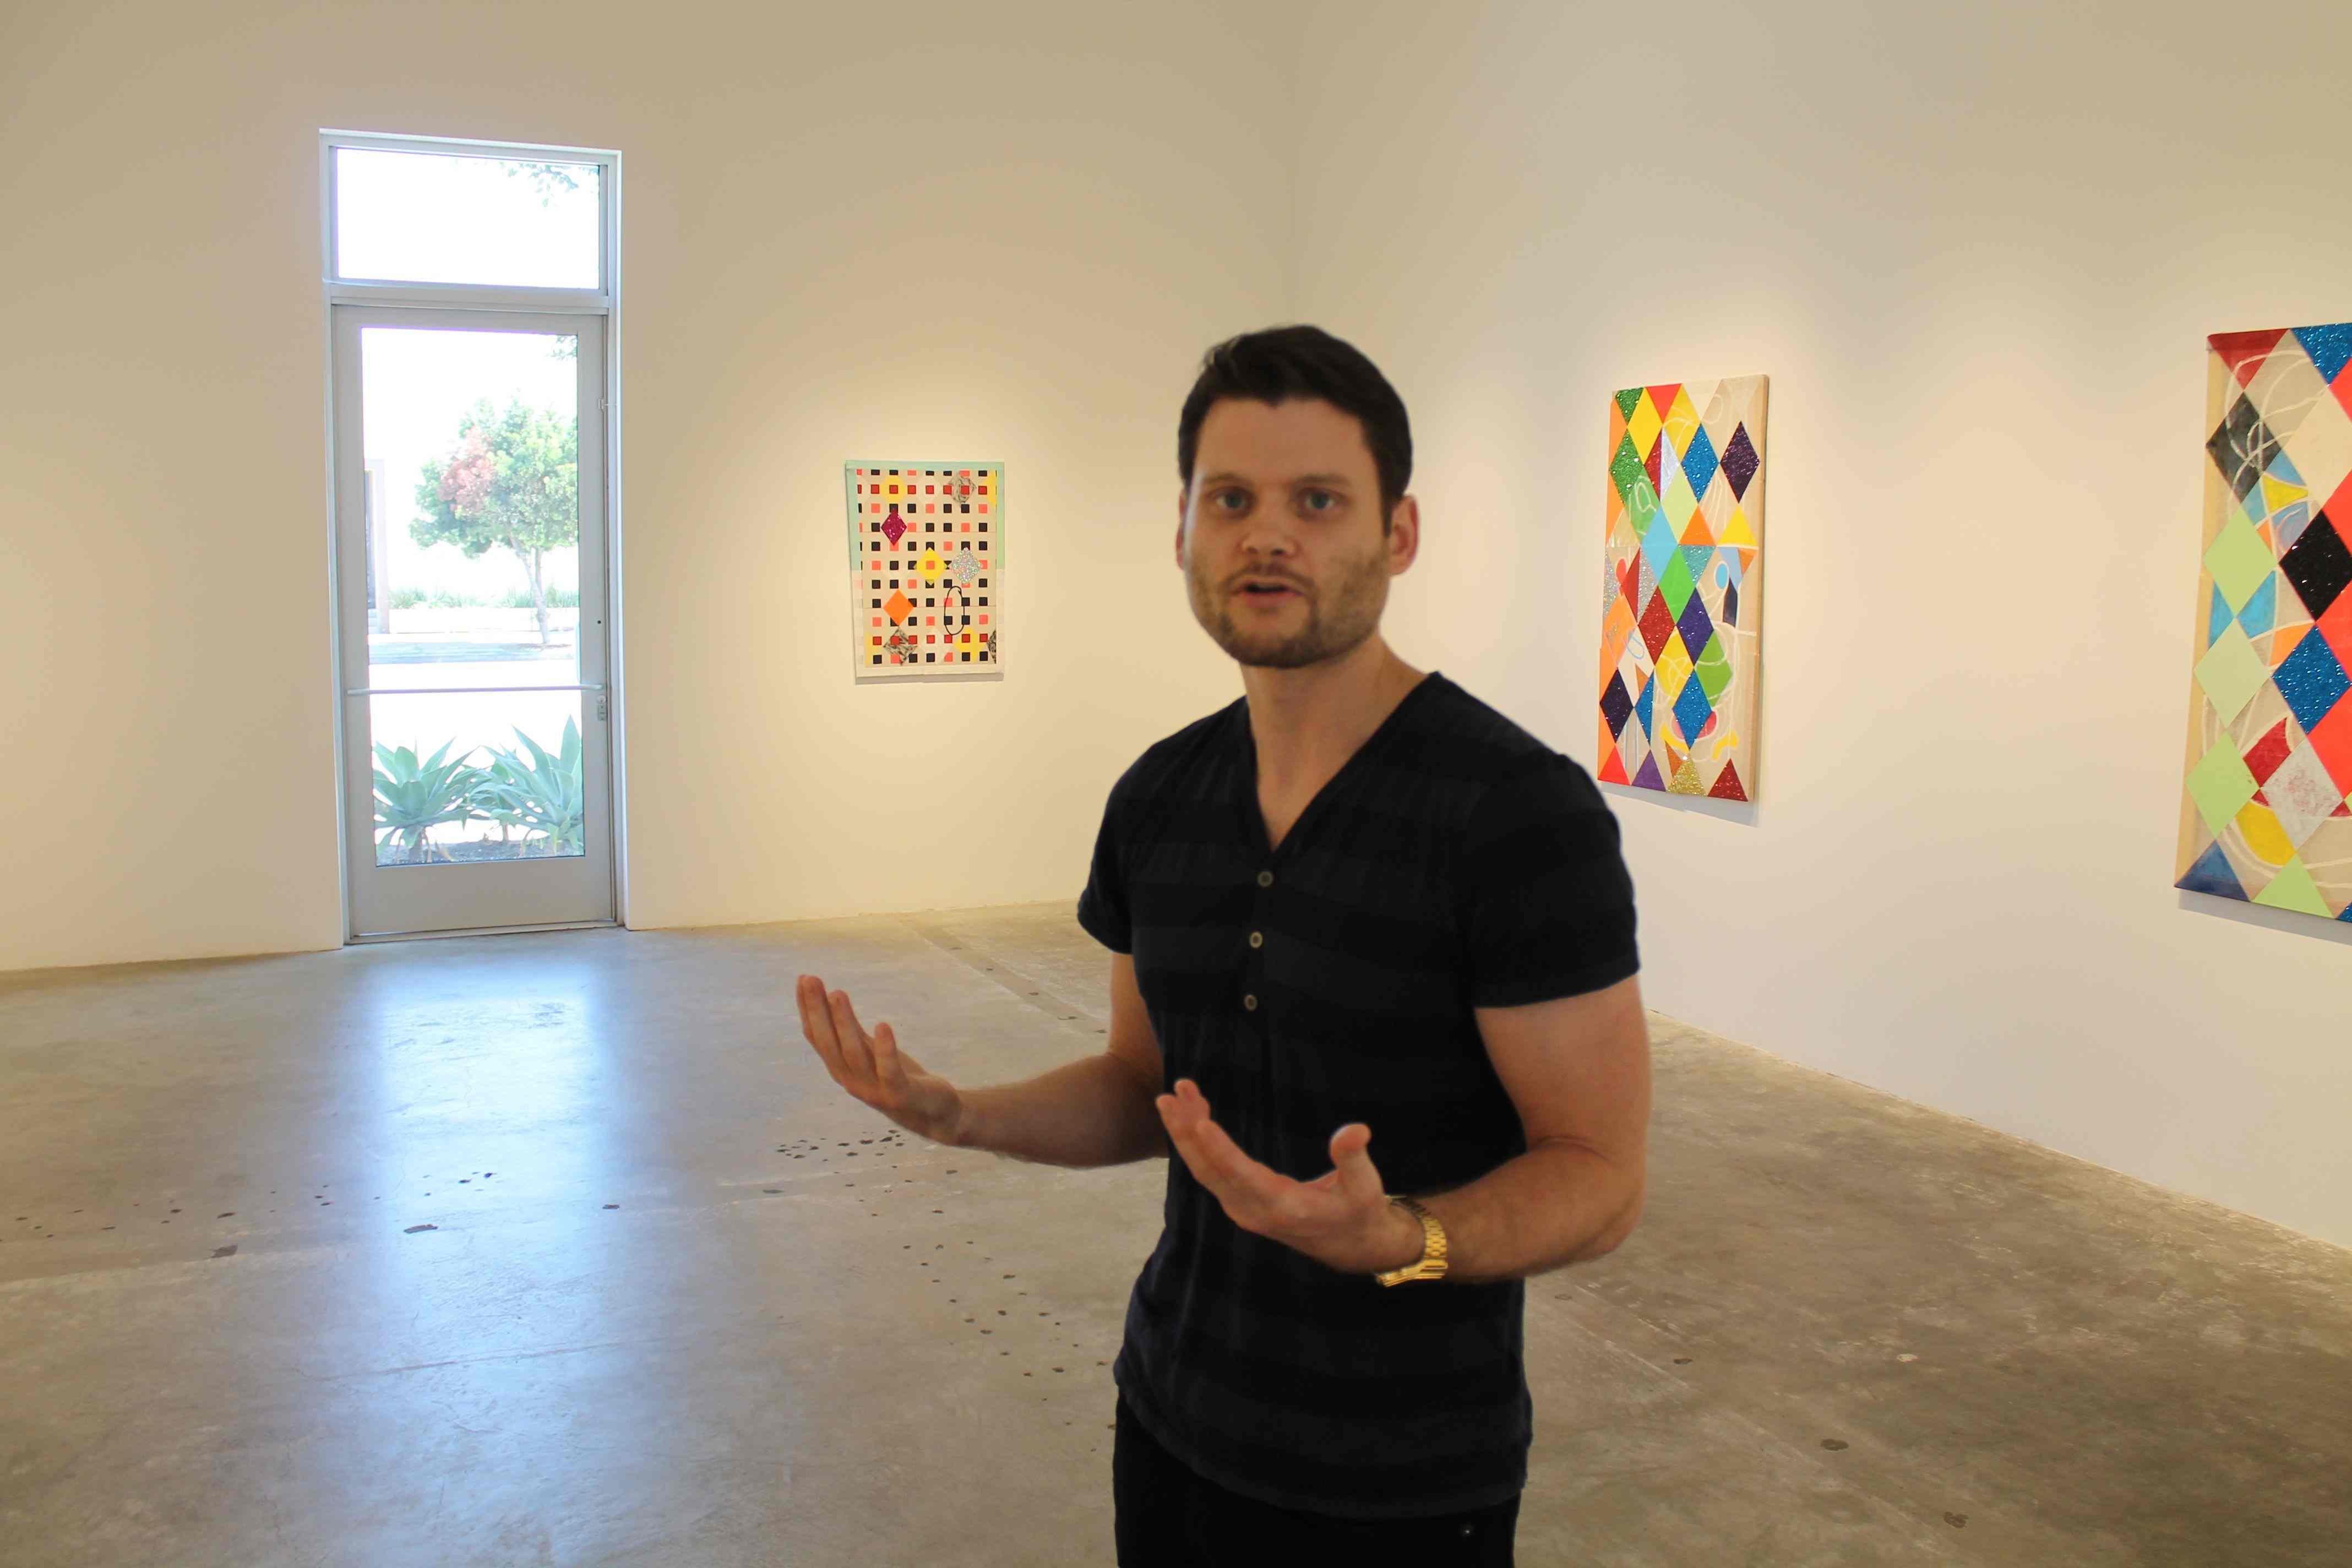 Abstraction, Unnerving: Matthew Carter's Scary Clowns